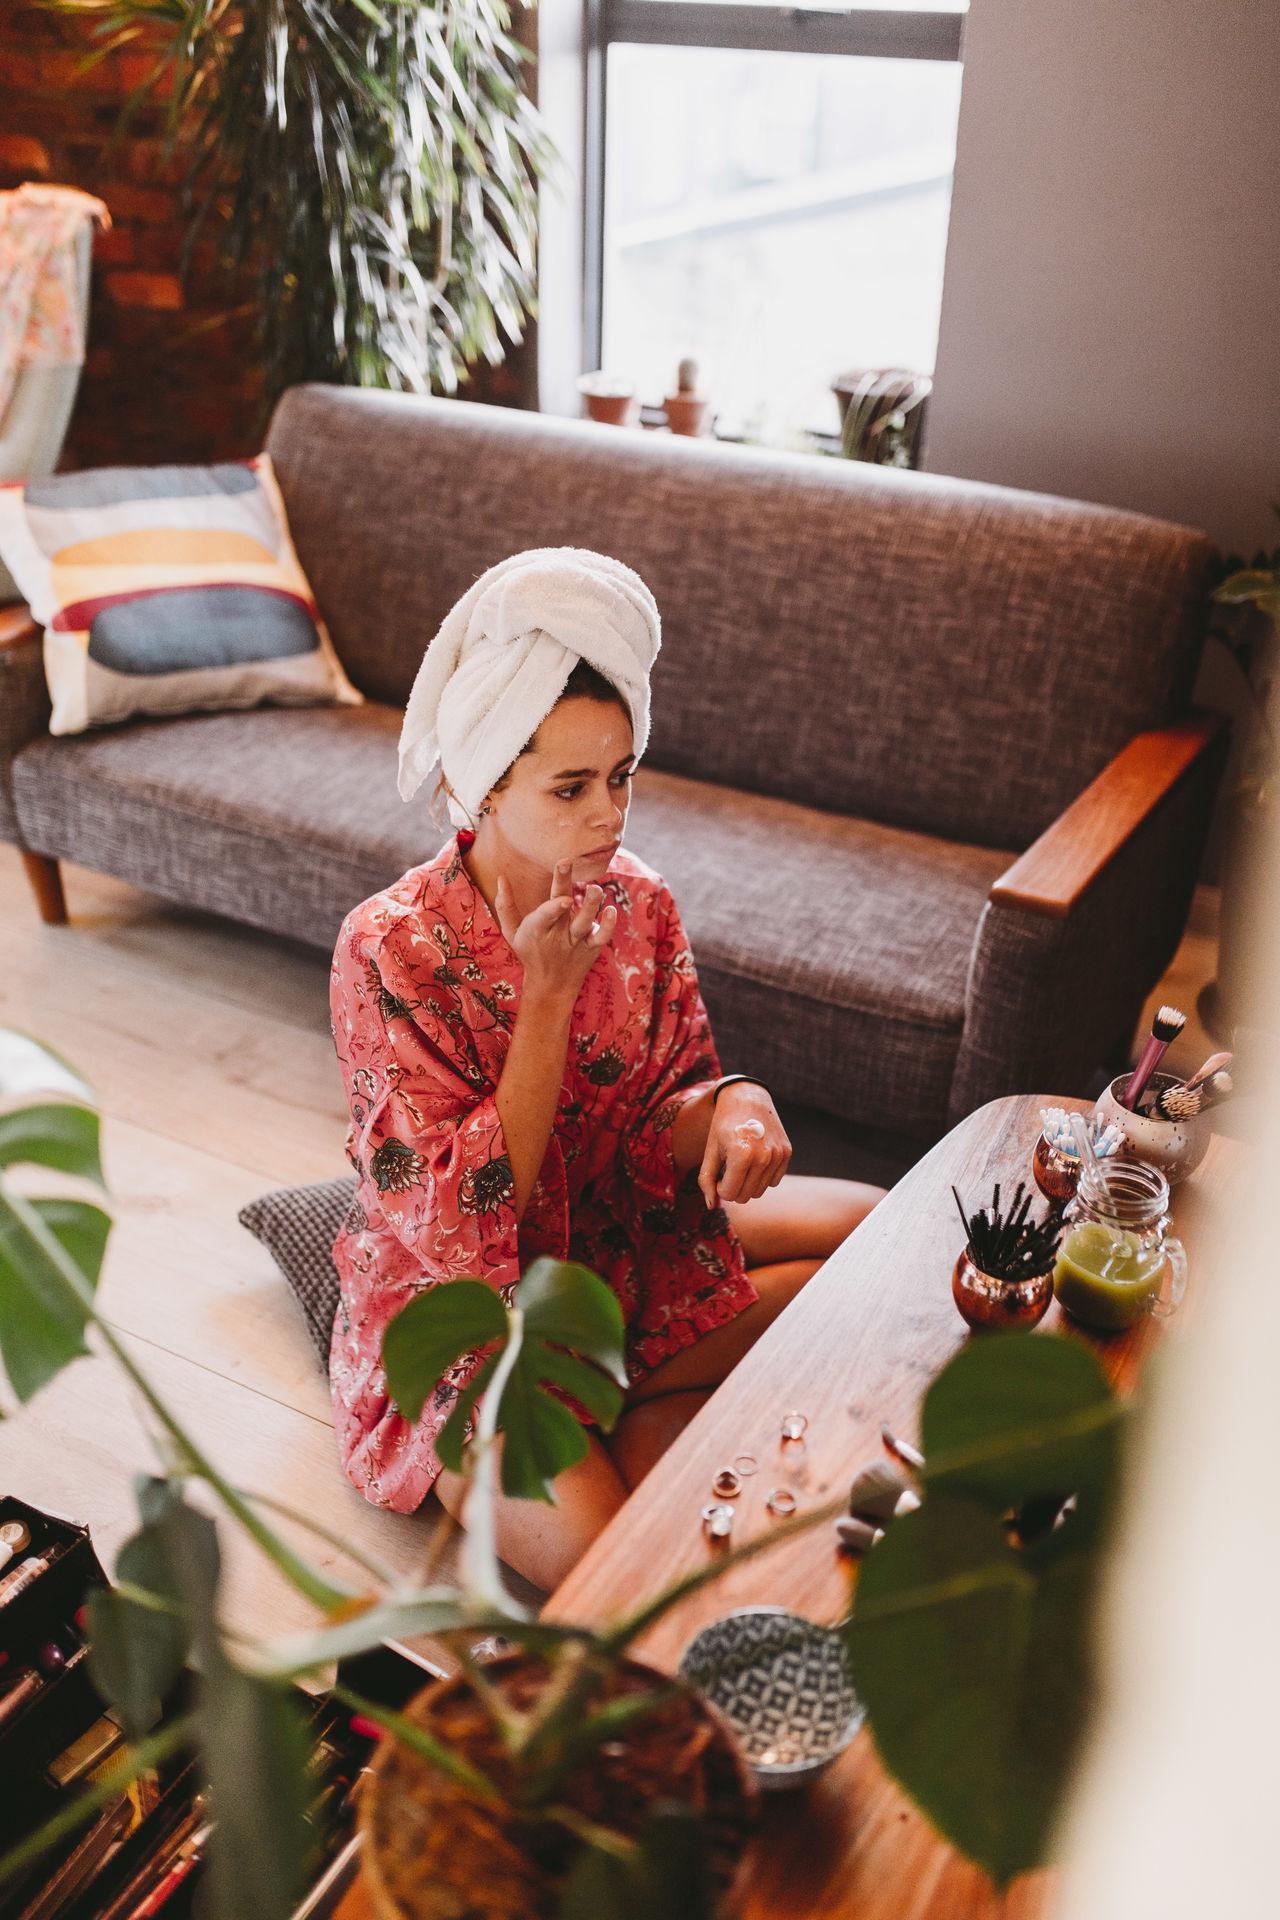 Woman applying facial mask while sitting at home